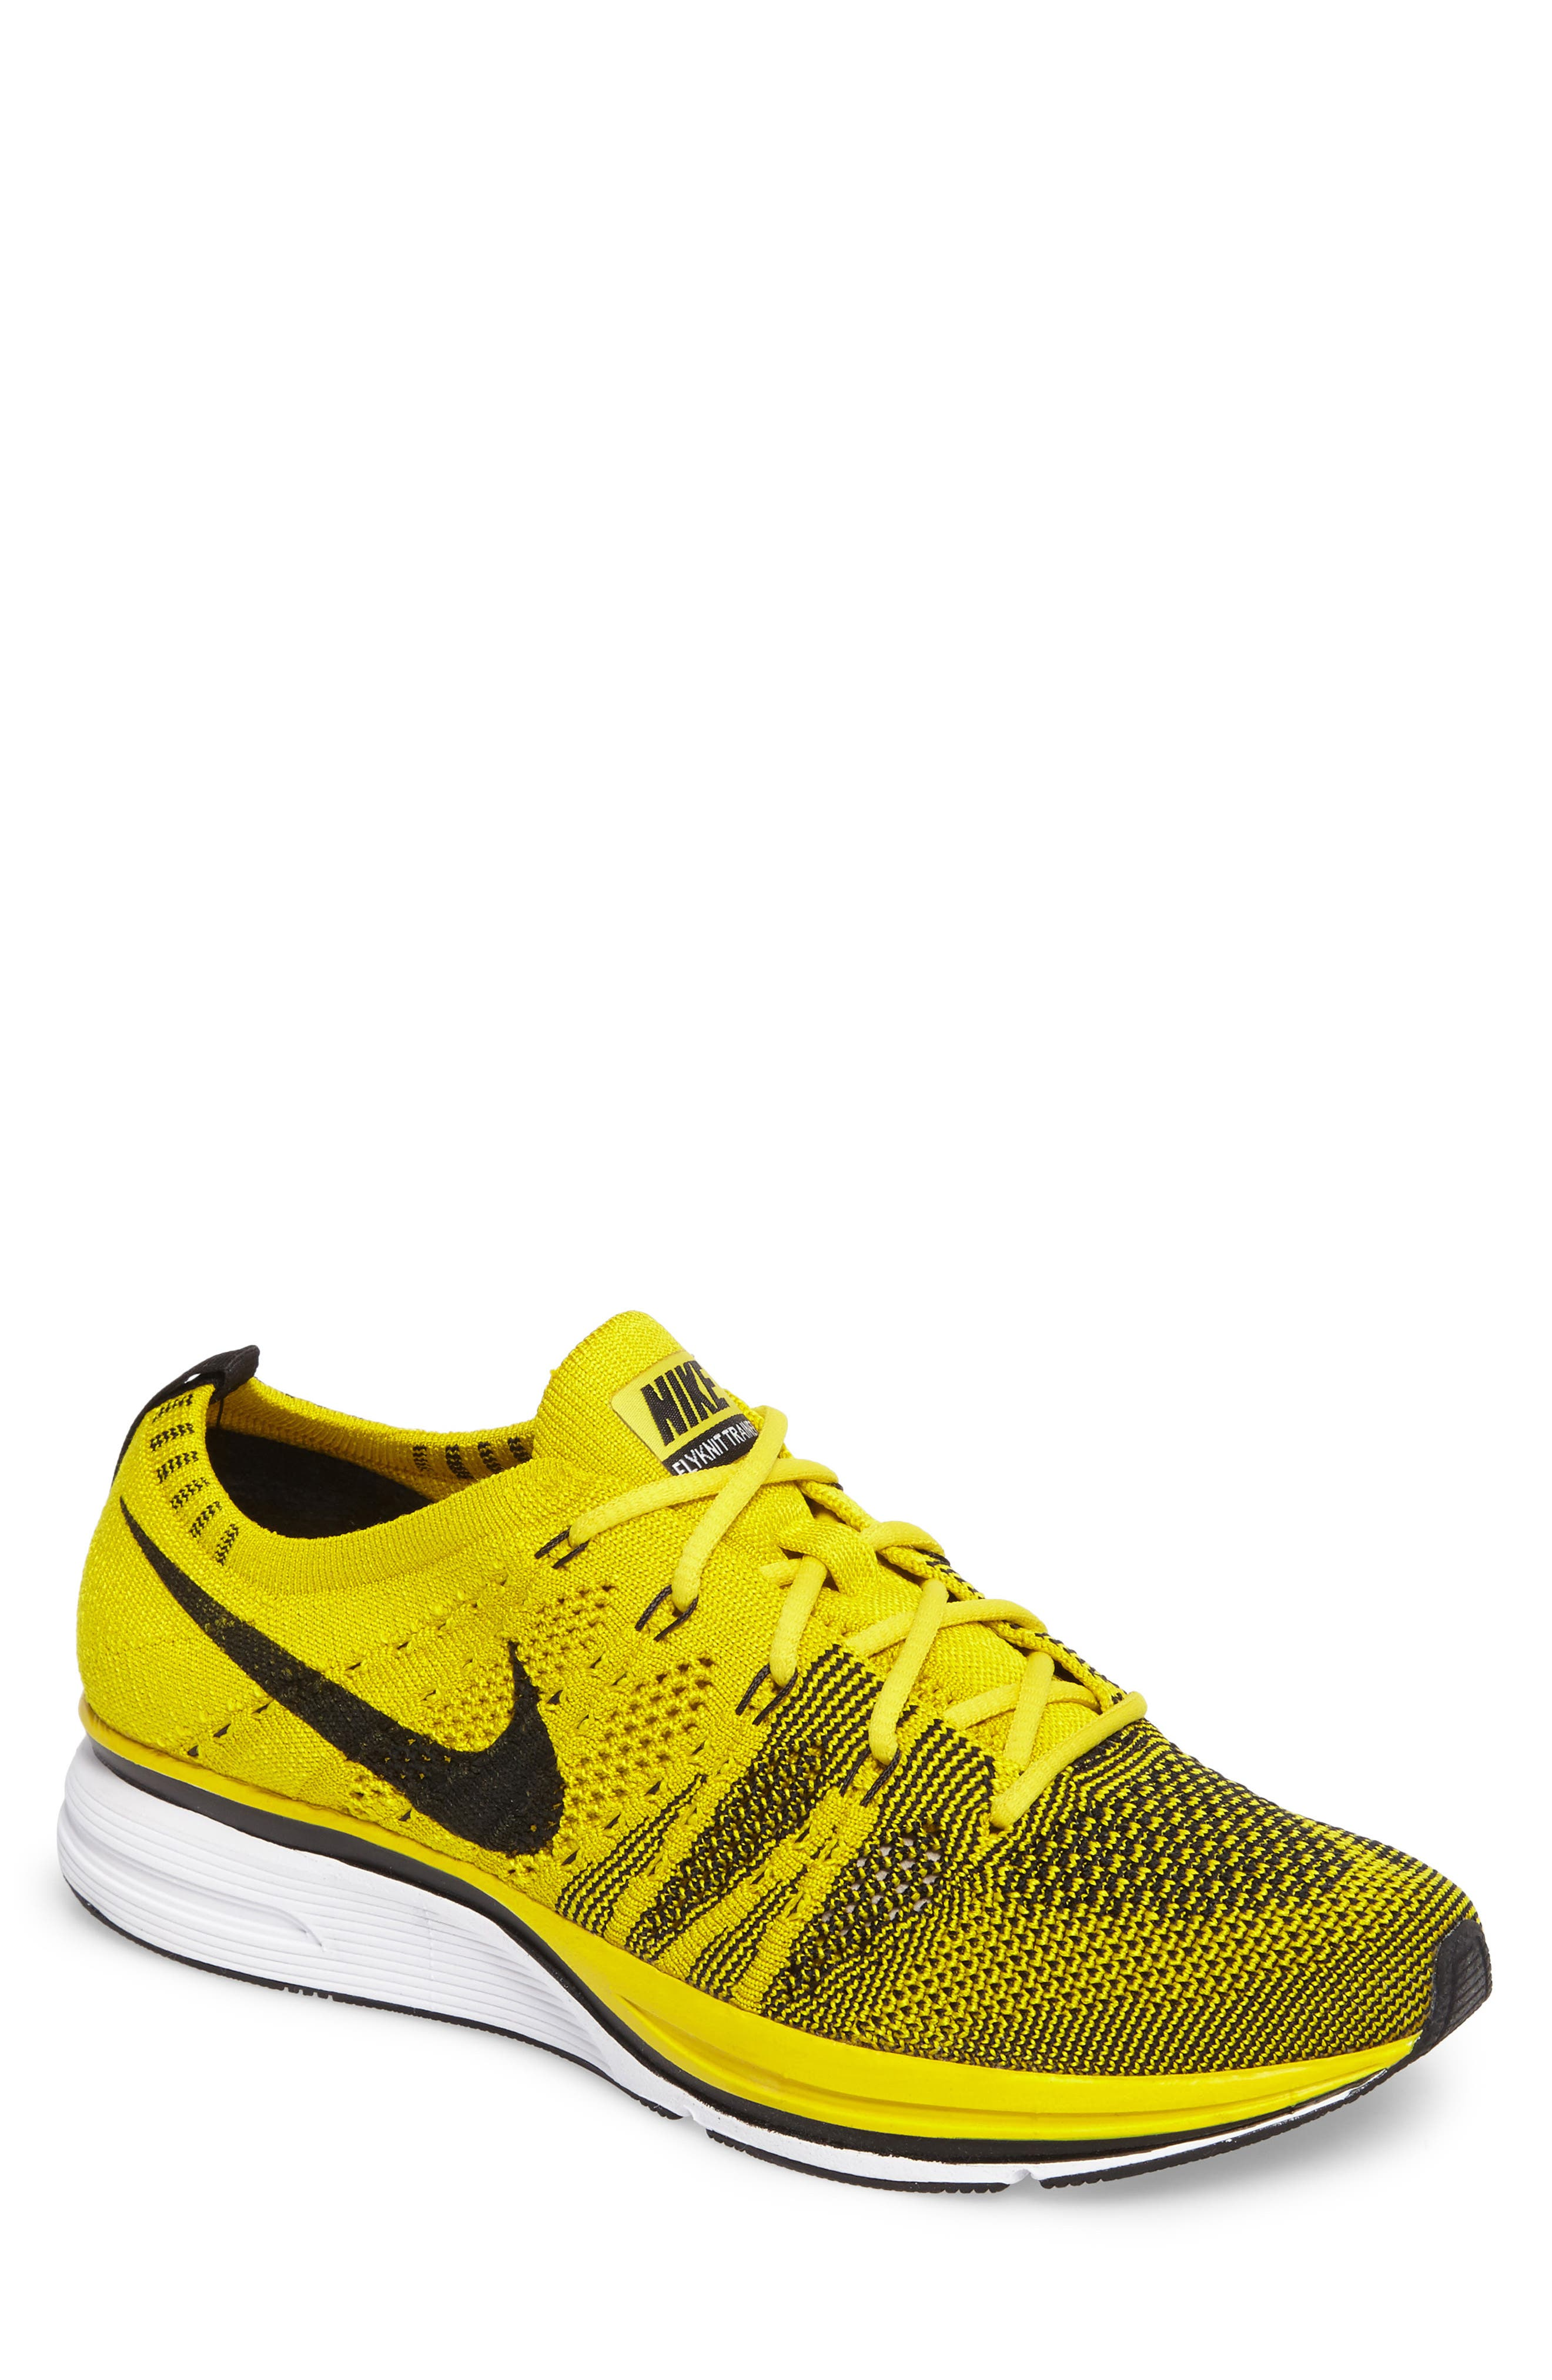 NikeLab Flyknit Trainer Sneaker,                         Main,                         color, Bright Citron/ Black/ White